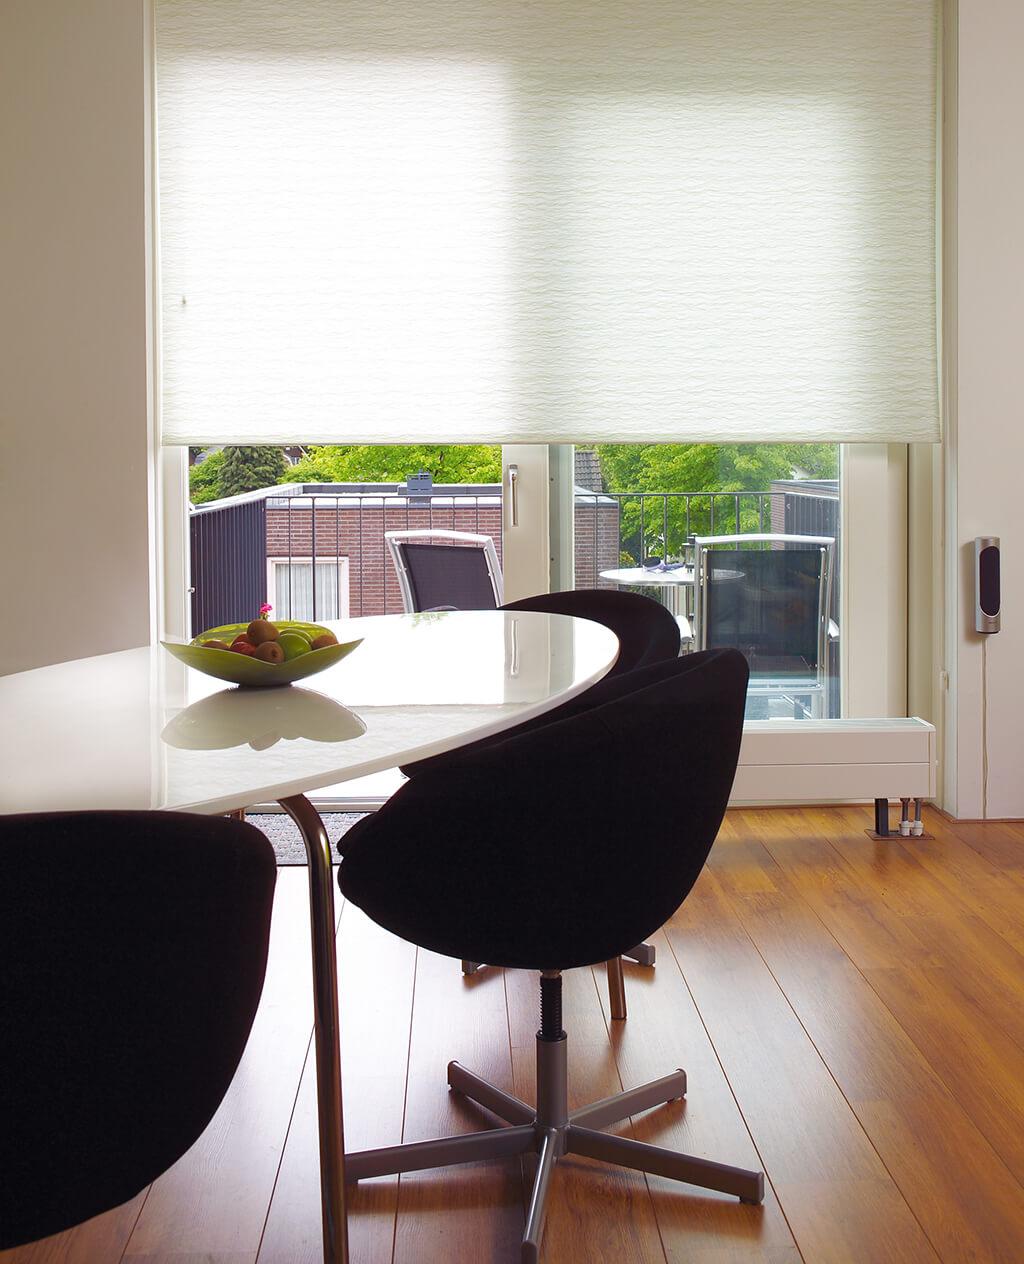 k chenschrank rollo dekor home design ideen. Black Bedroom Furniture Sets. Home Design Ideas